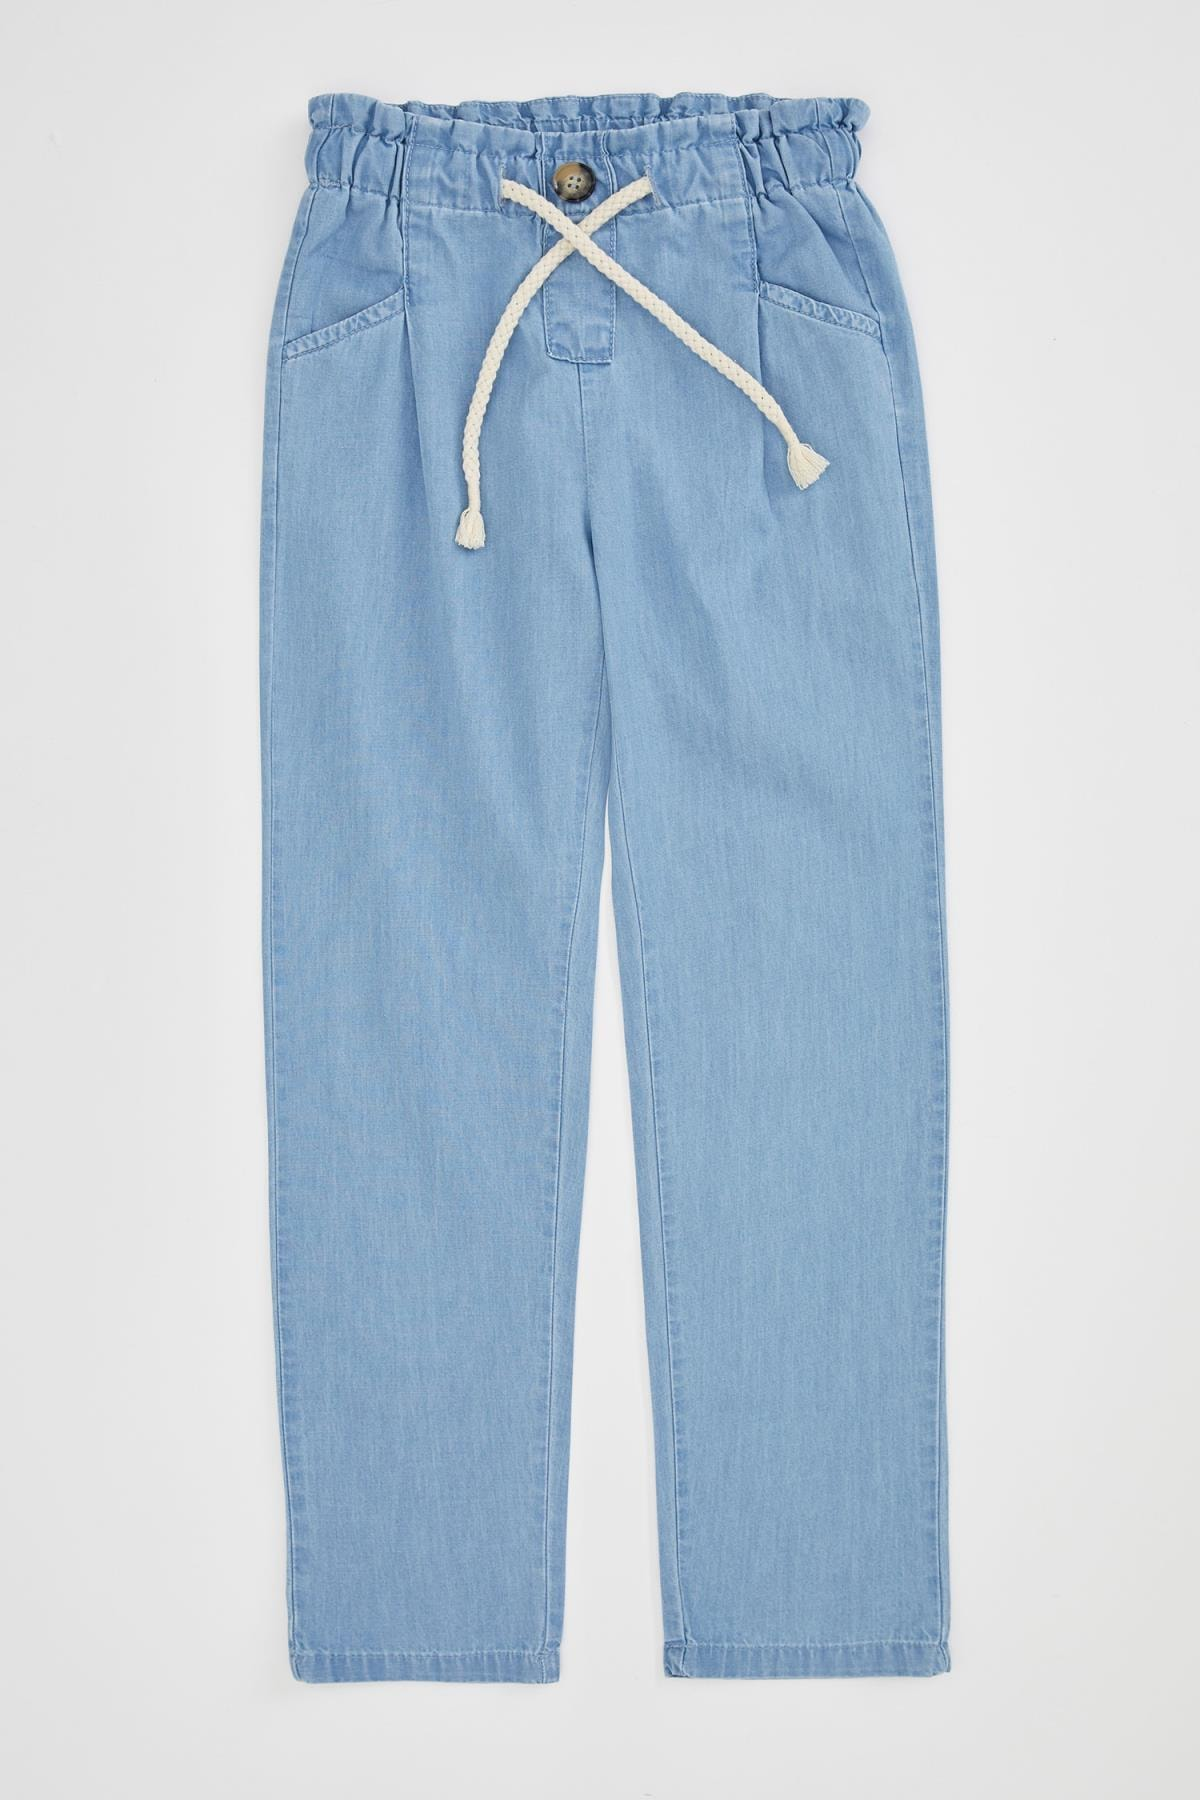 DeFacto Kız Çocuk Mavi Kot Pantolon 1